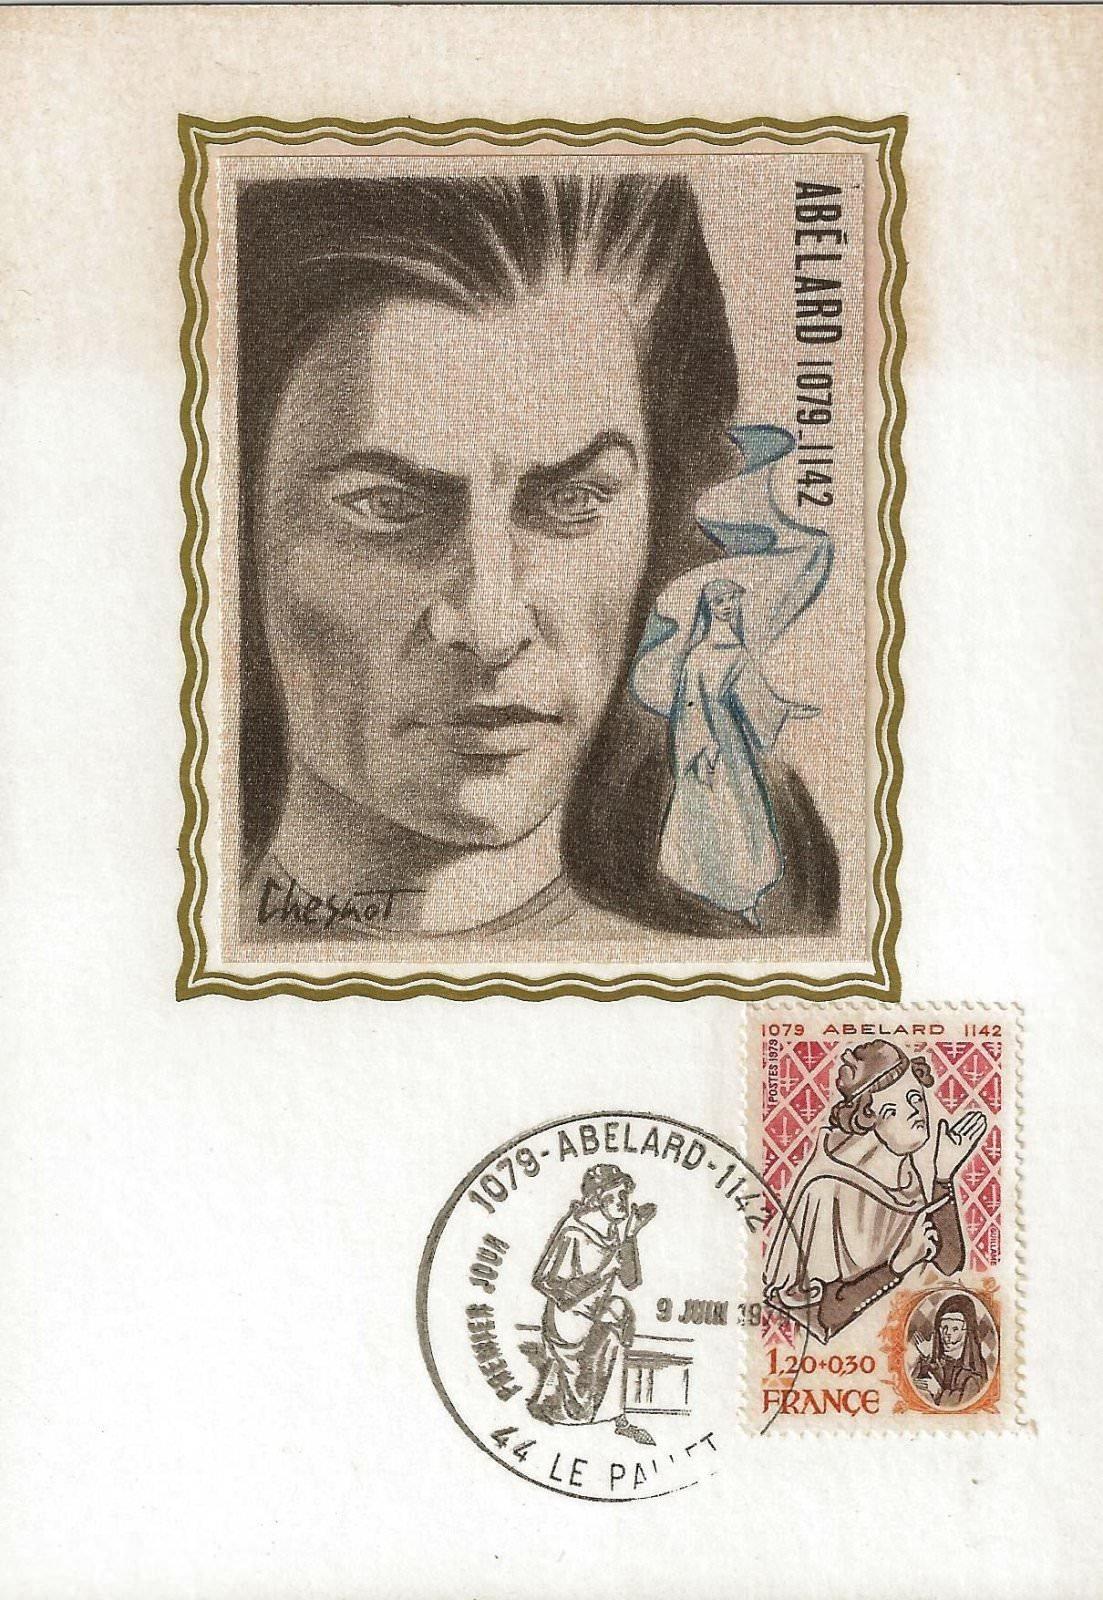 1979abelard